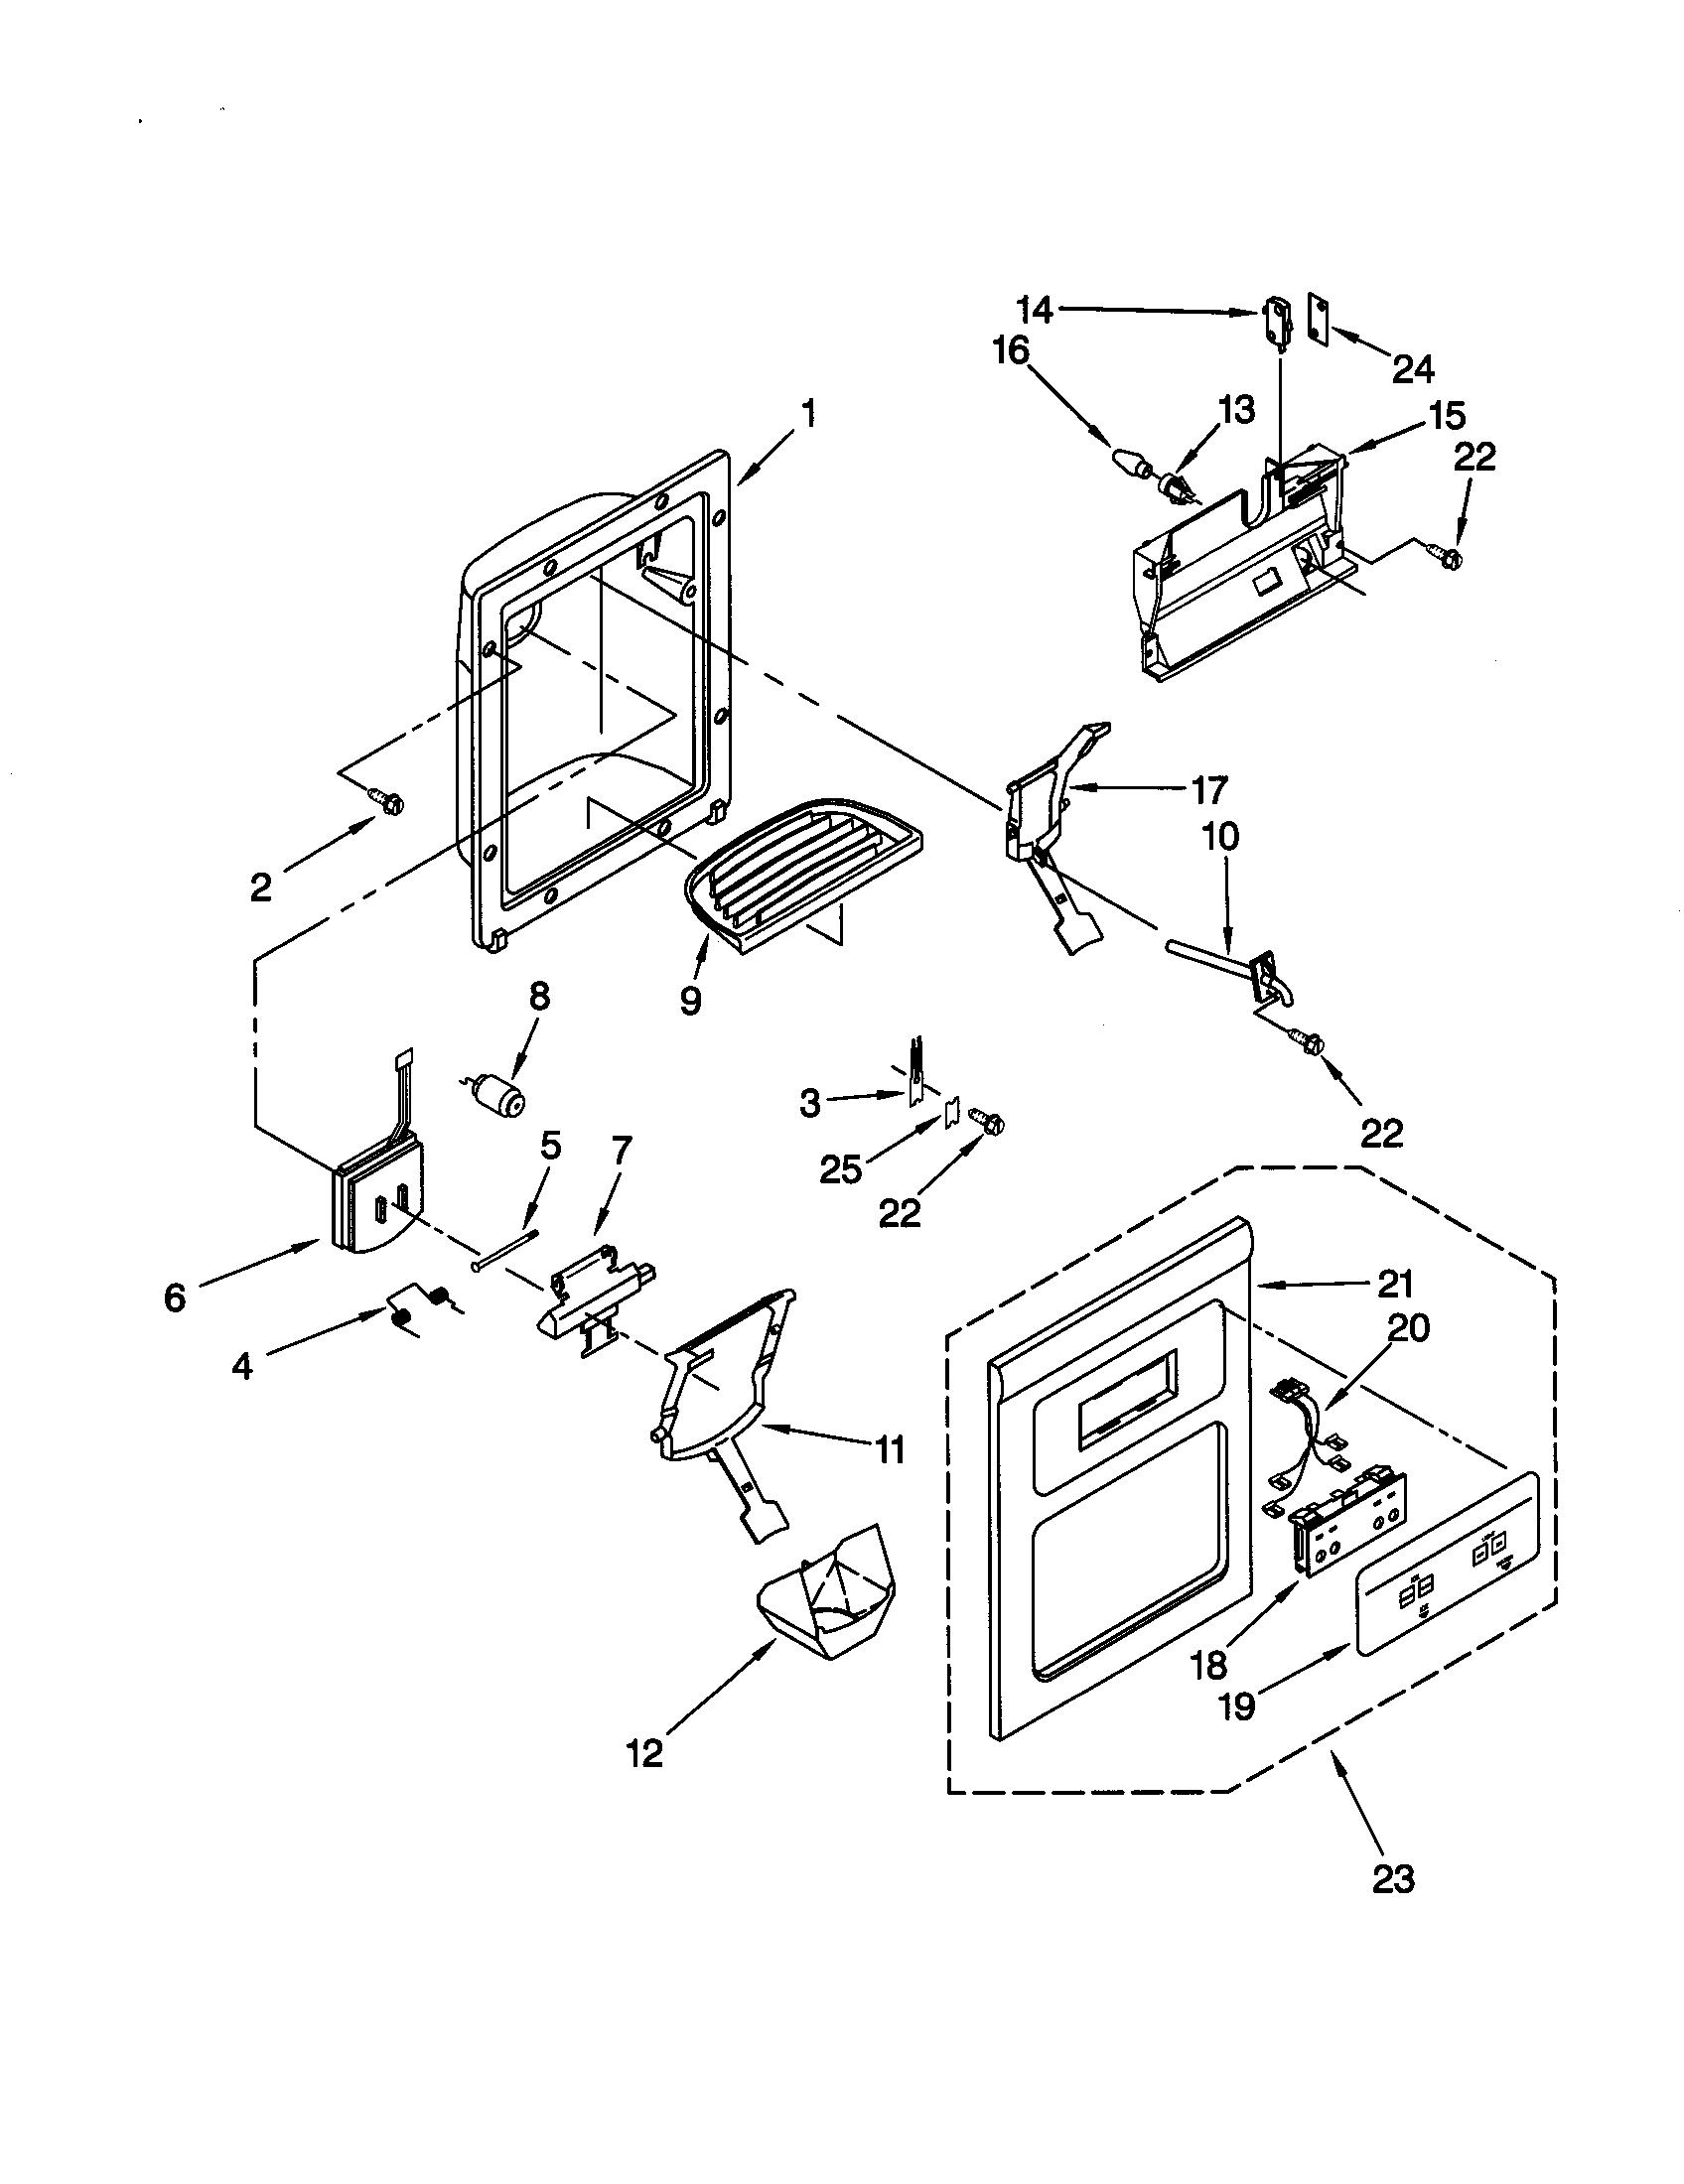 DISPENSER FRONT Diagram & Parts List for Model 10659592990